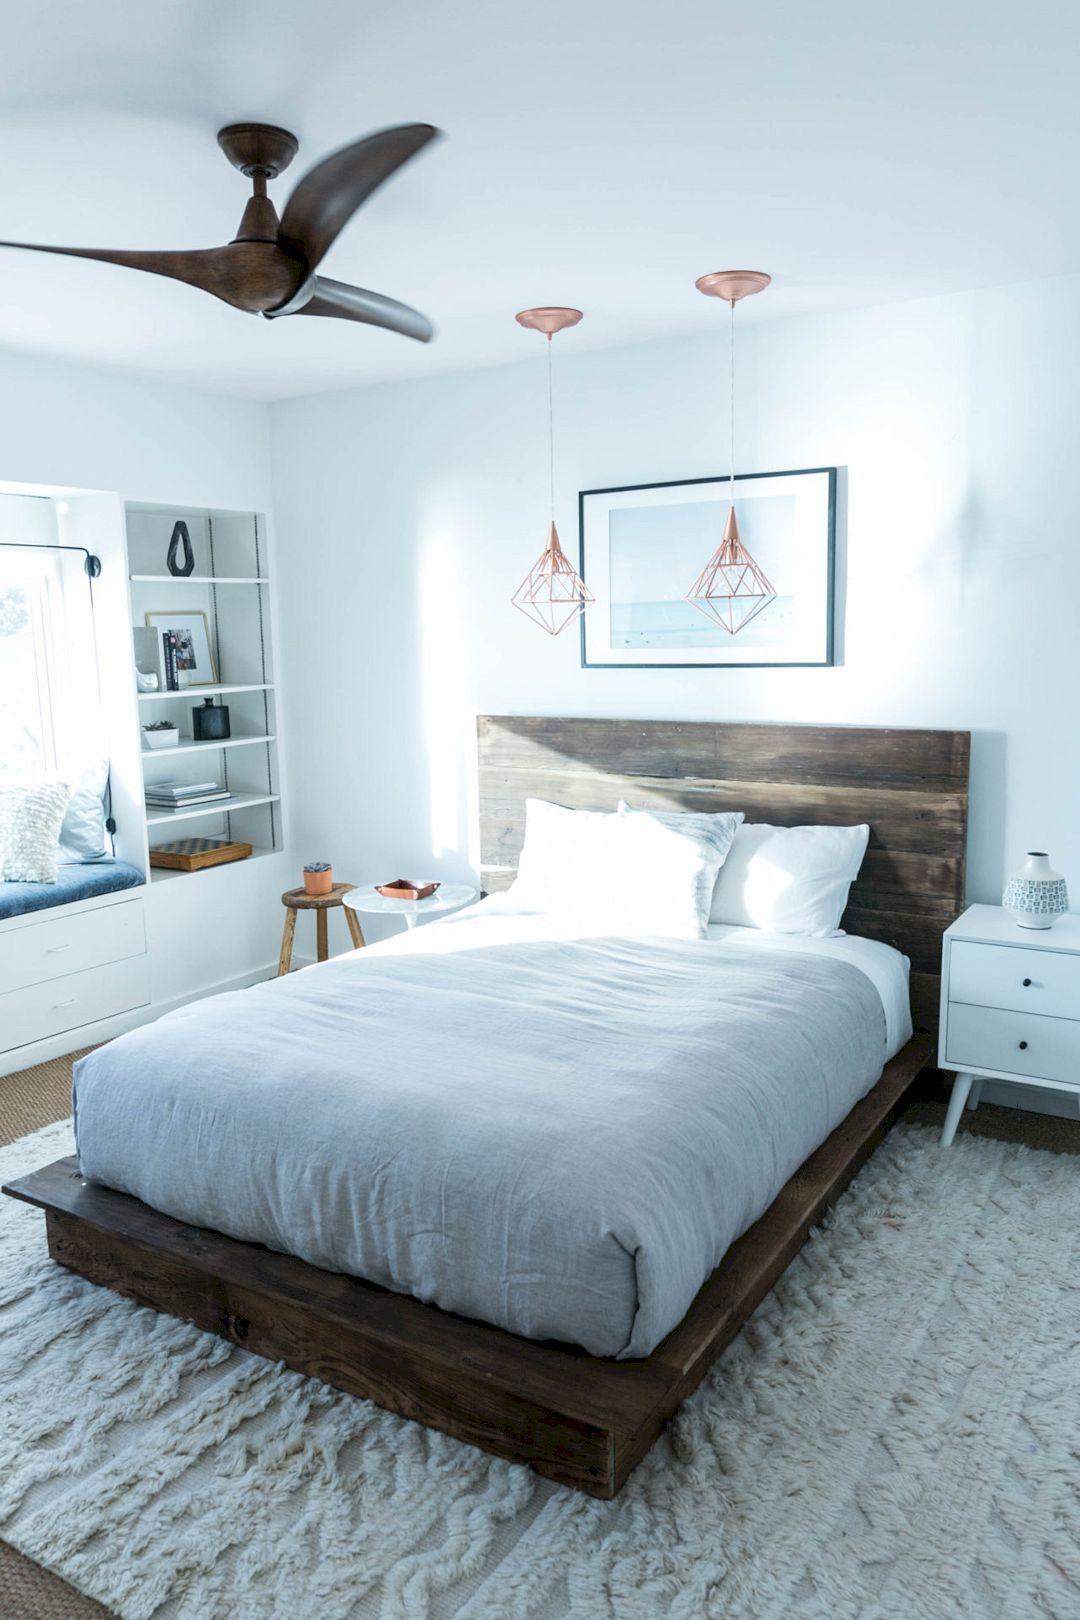 Stunning modern home decor ideas modern retro and wall hangings